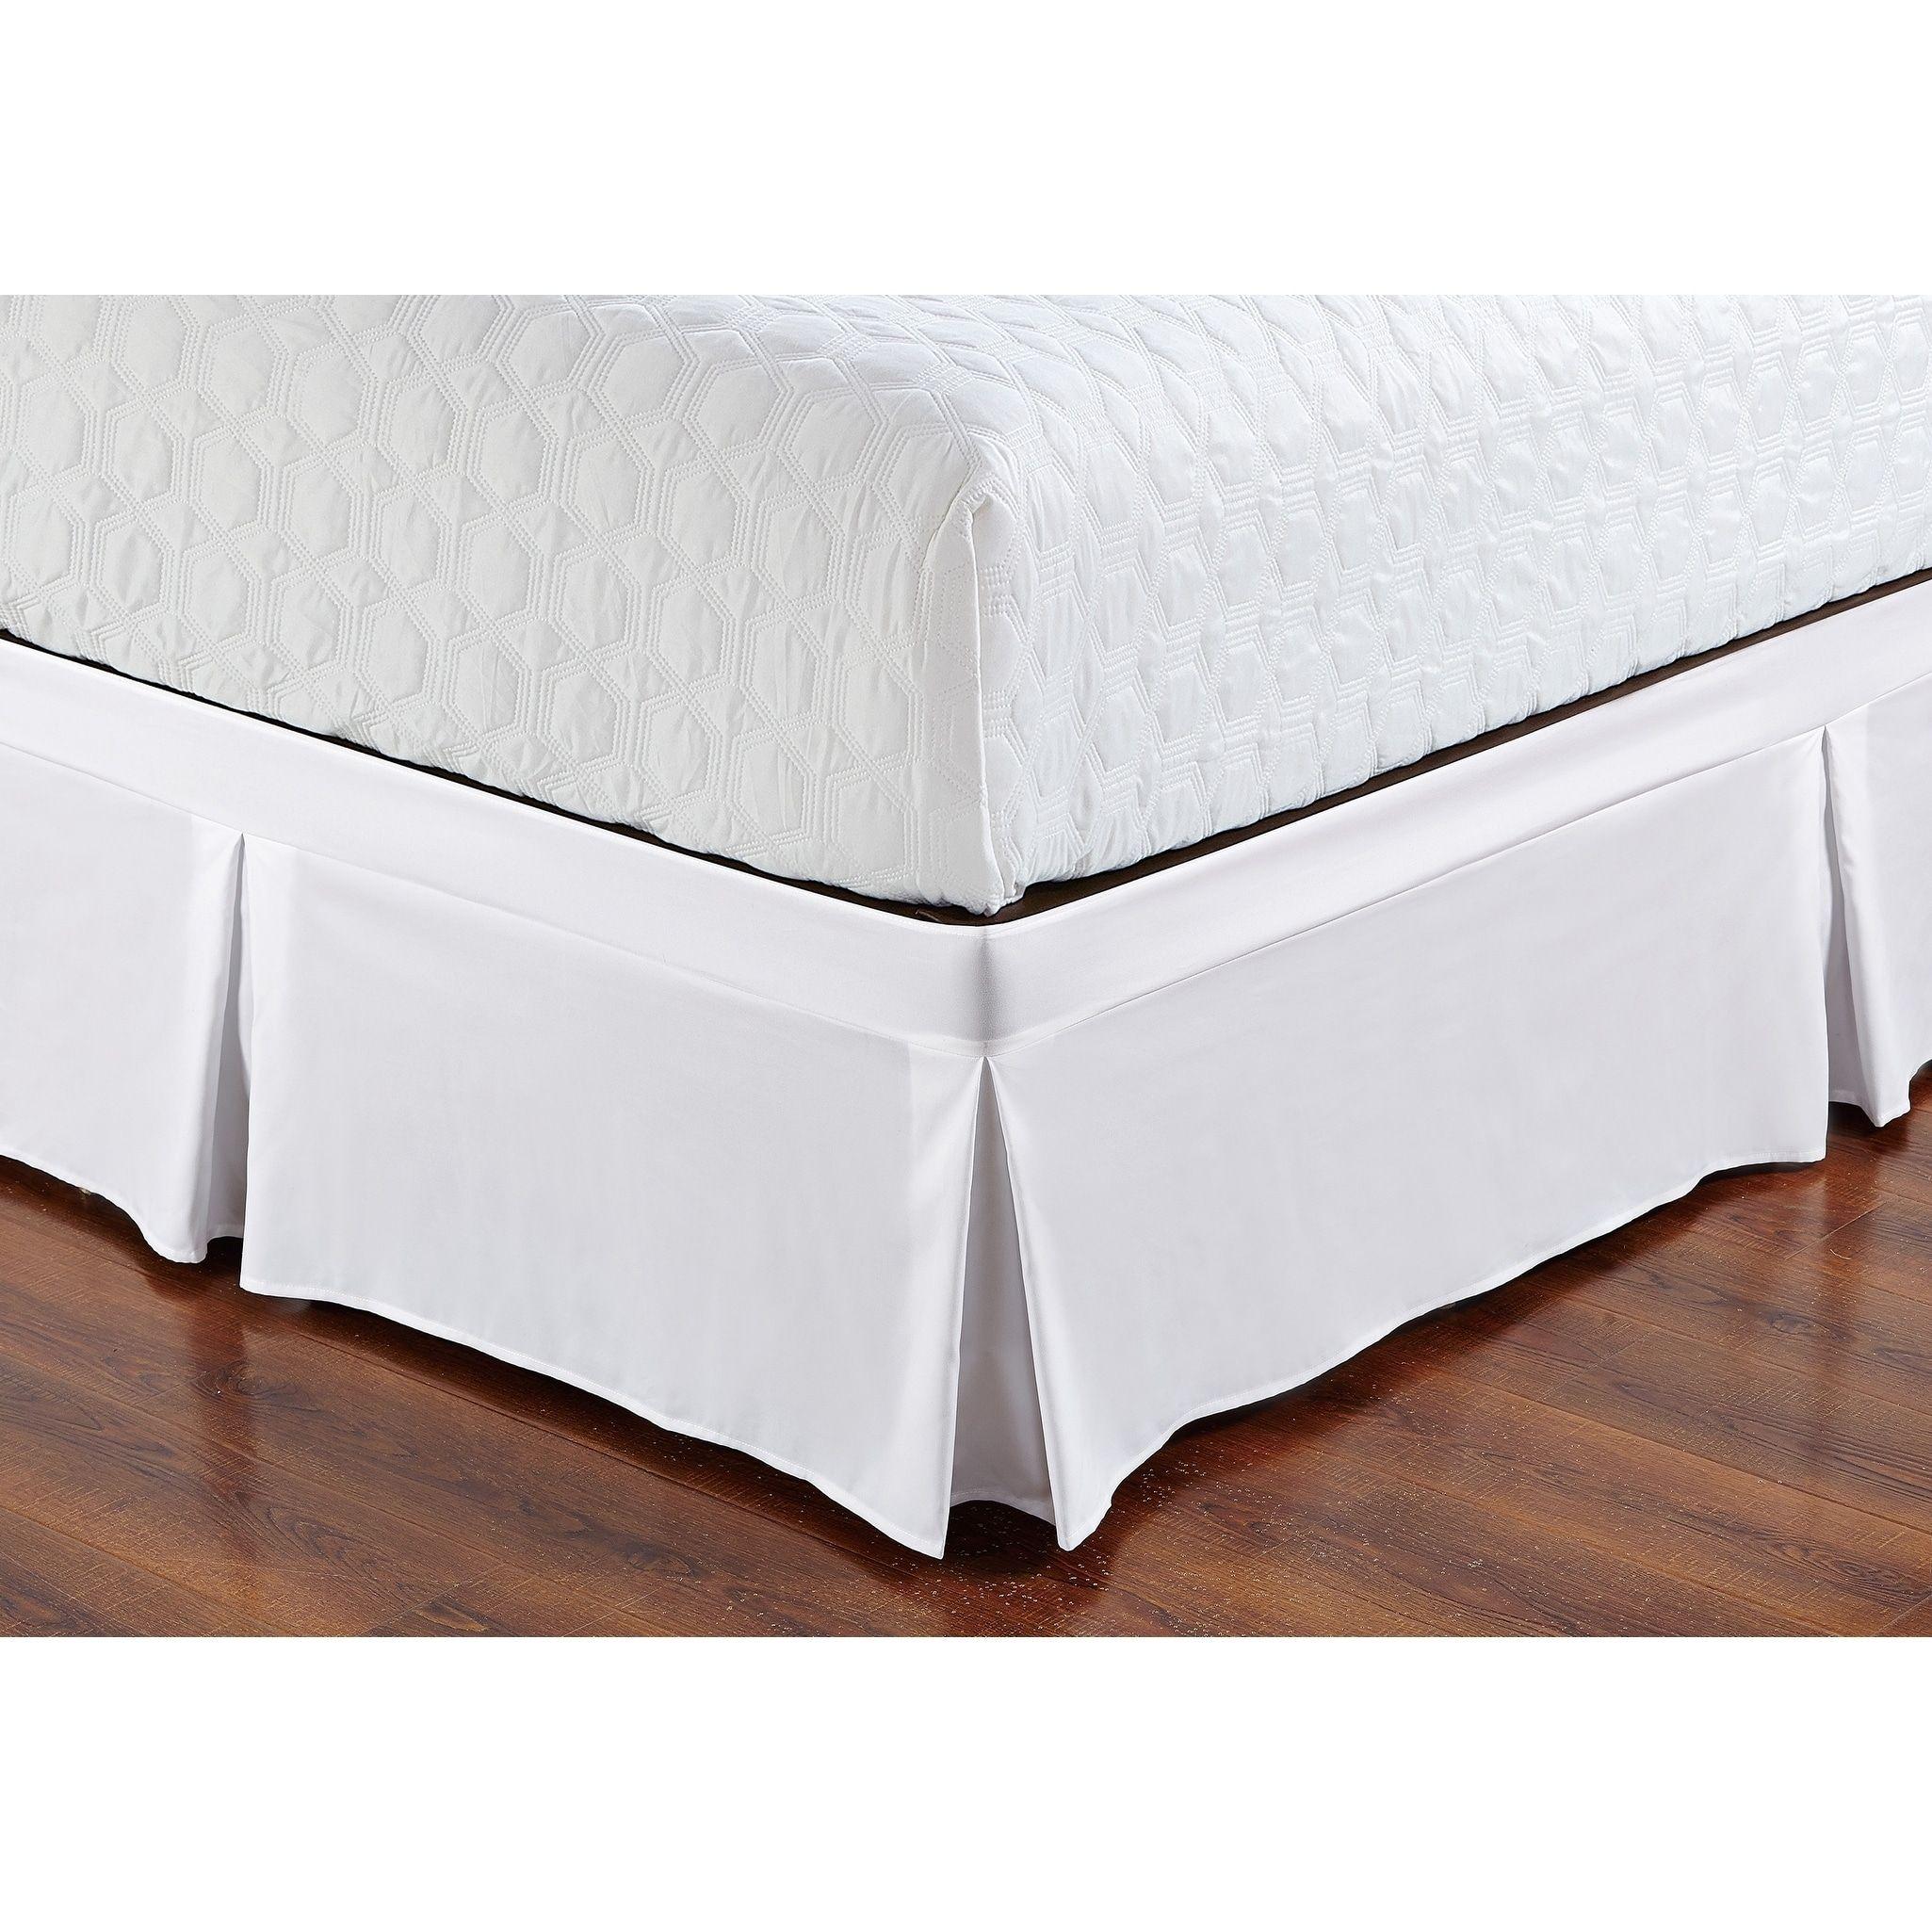 orient de moocci wrap around style tailored bed skirt 16 drop